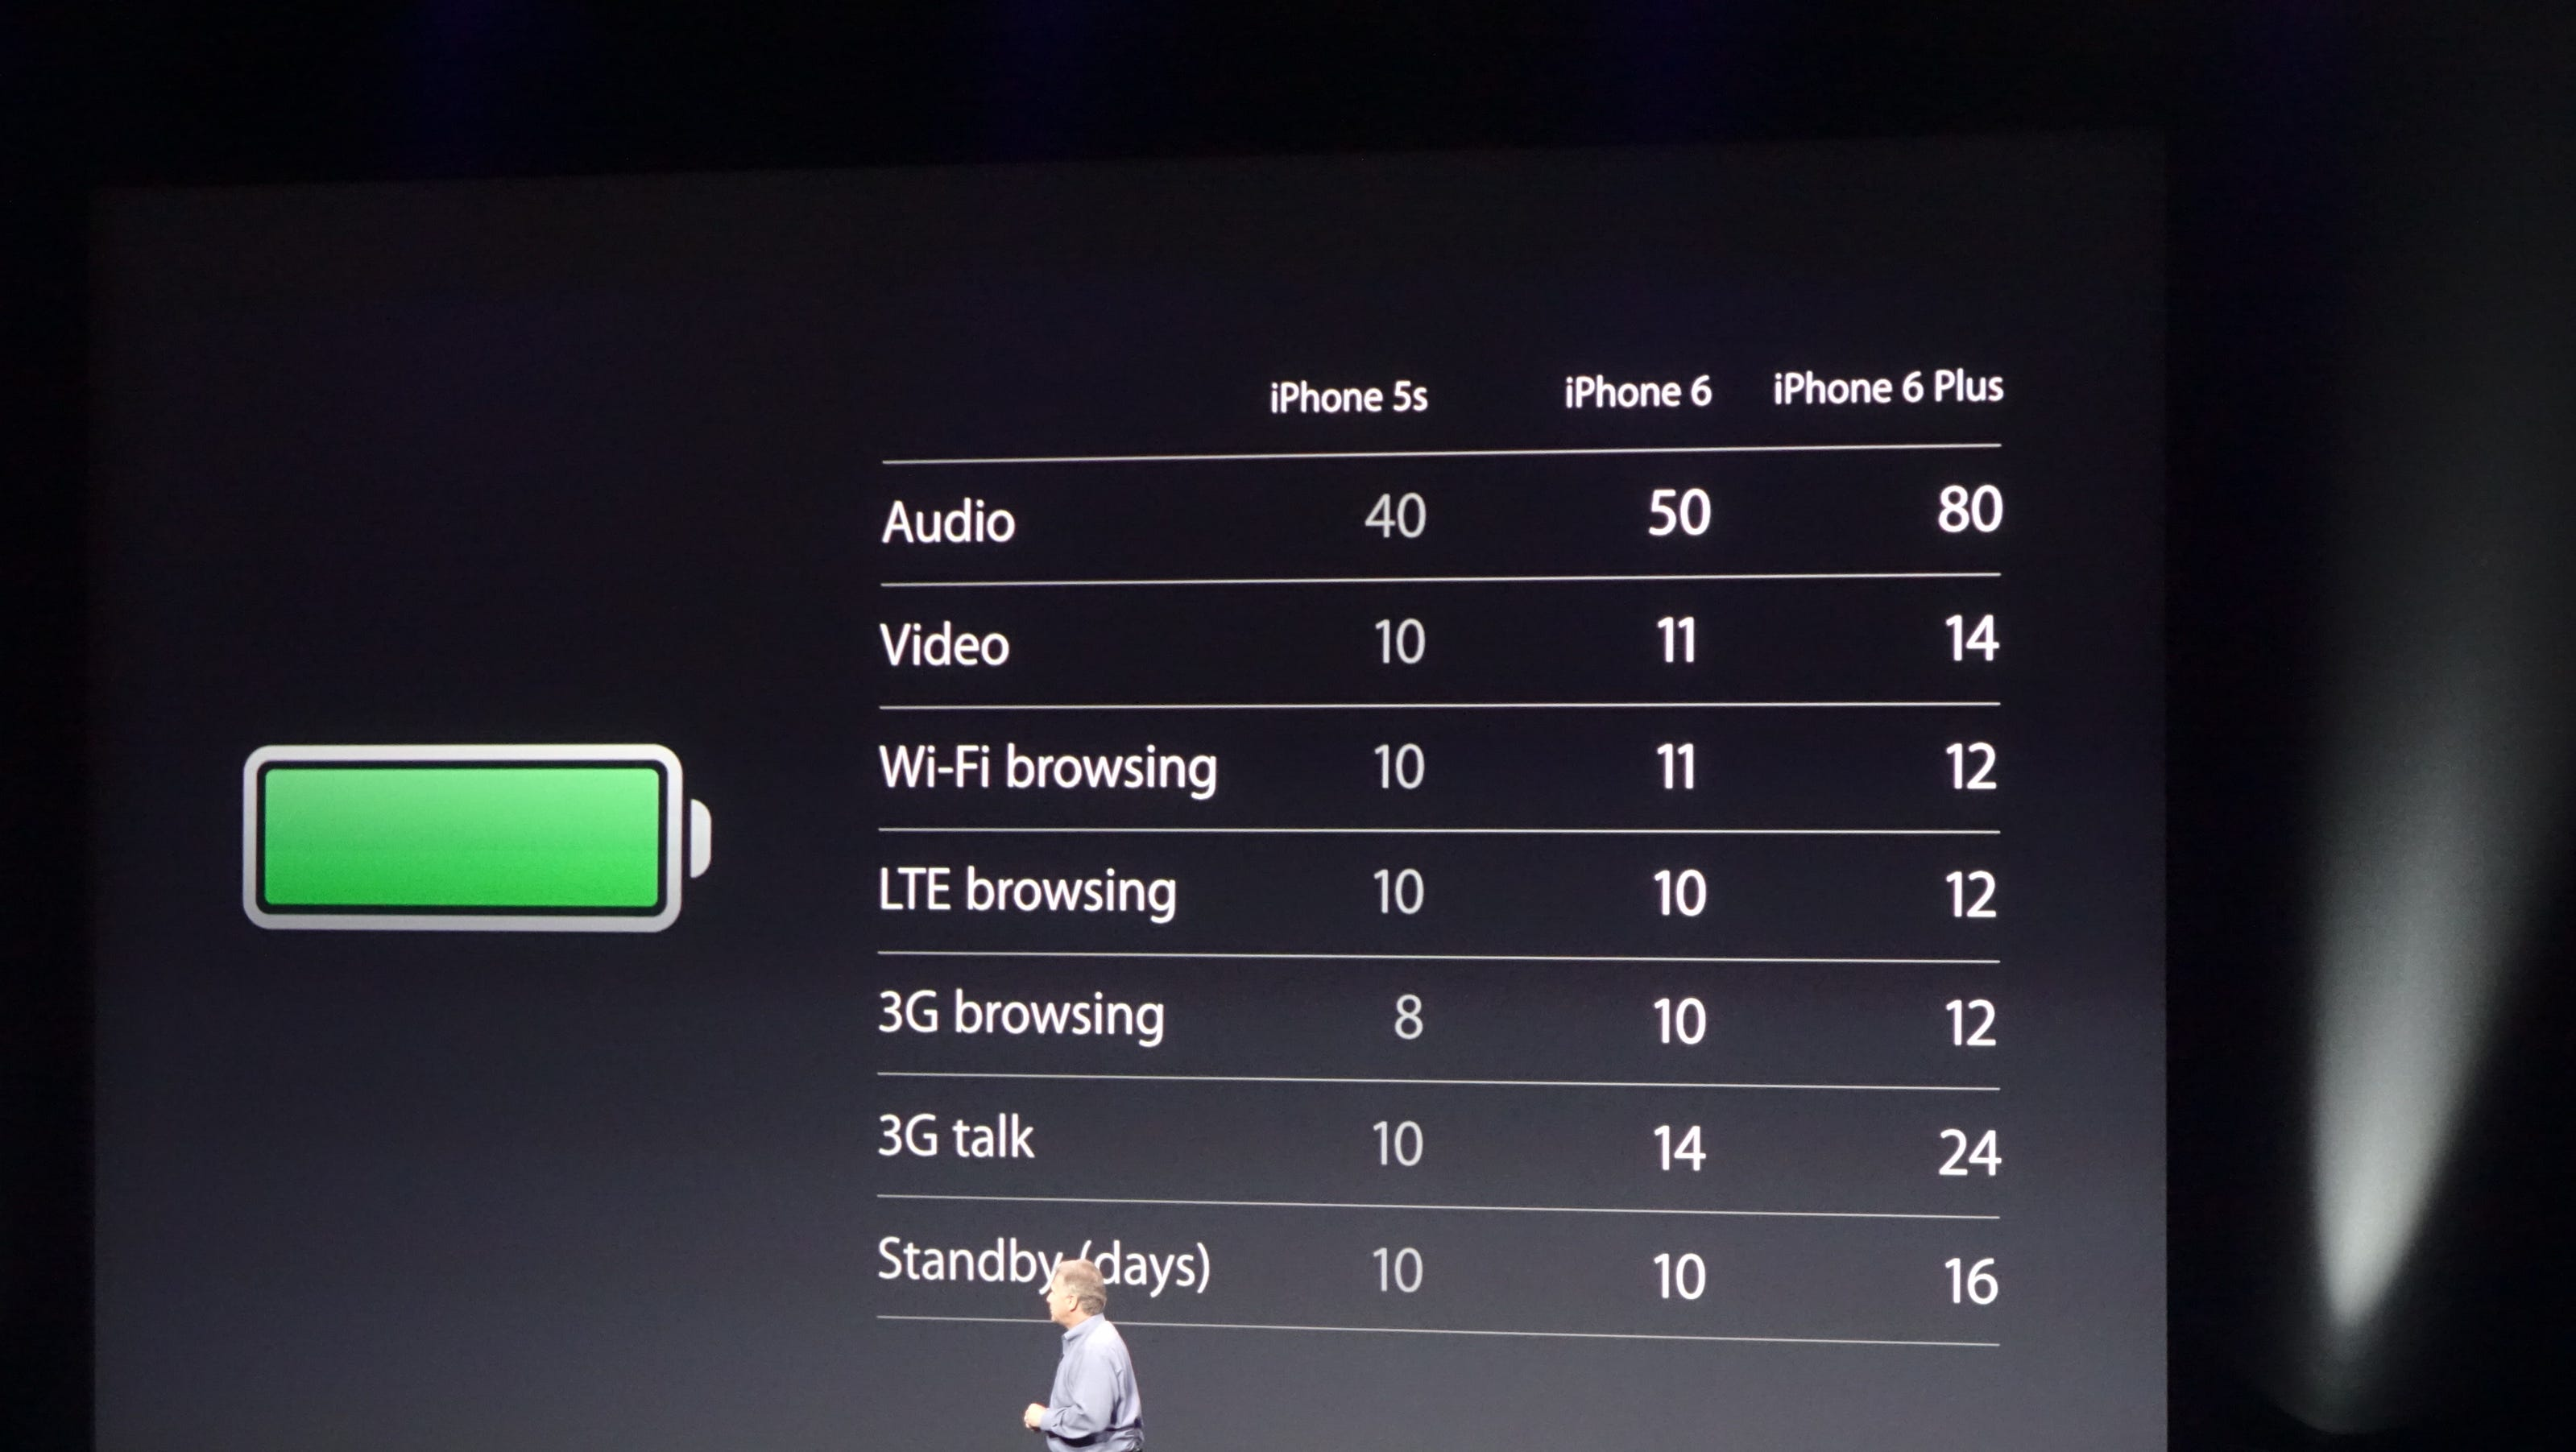 Apple boasts better battery on iphone 6 plus